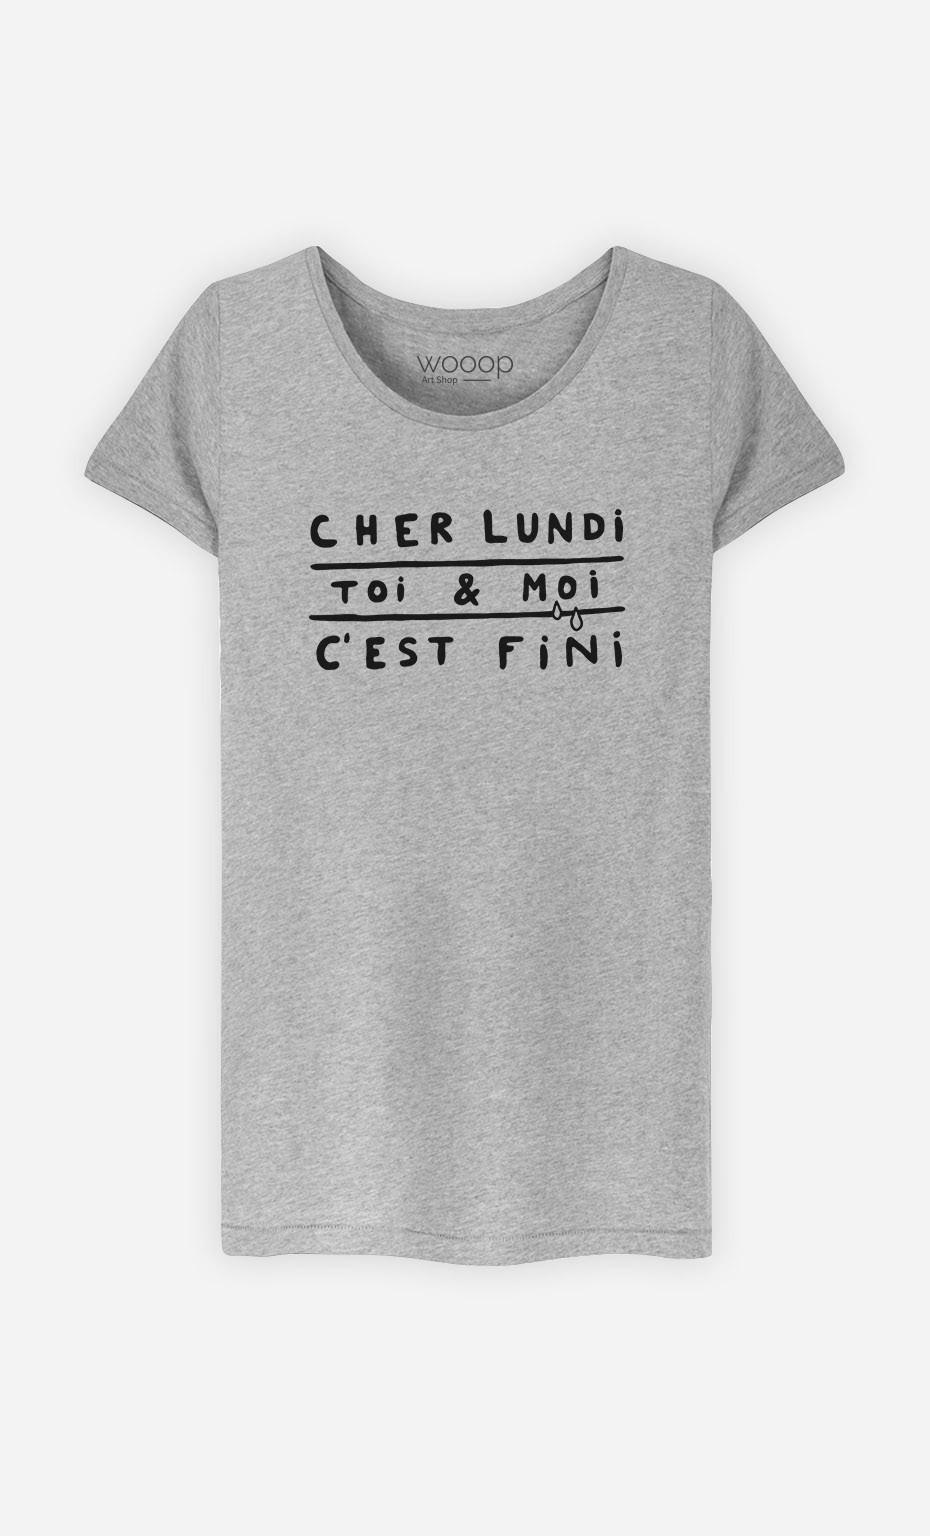 T-Shirt Femme Cher Lundi Toi et Moi C'est Fini